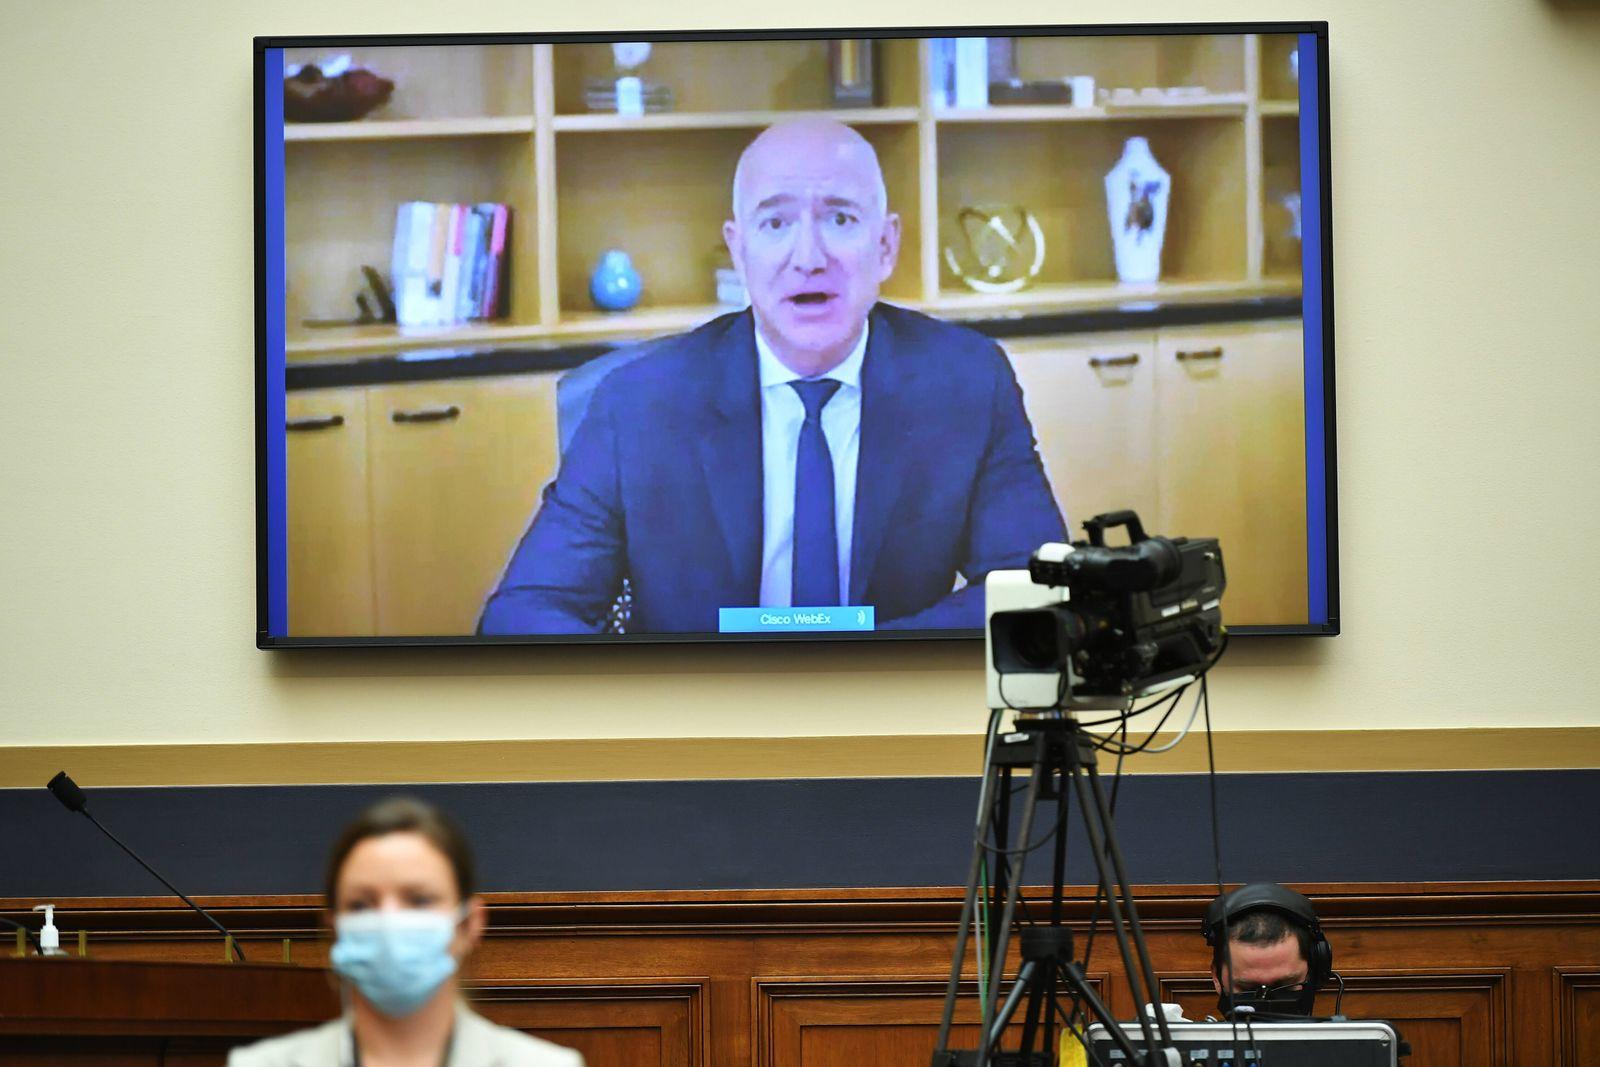 July 29, 2020, Washington, District of Columbia, USA: Amazon CEO Jeff Bezos testifies before the House Judiciary Subcom